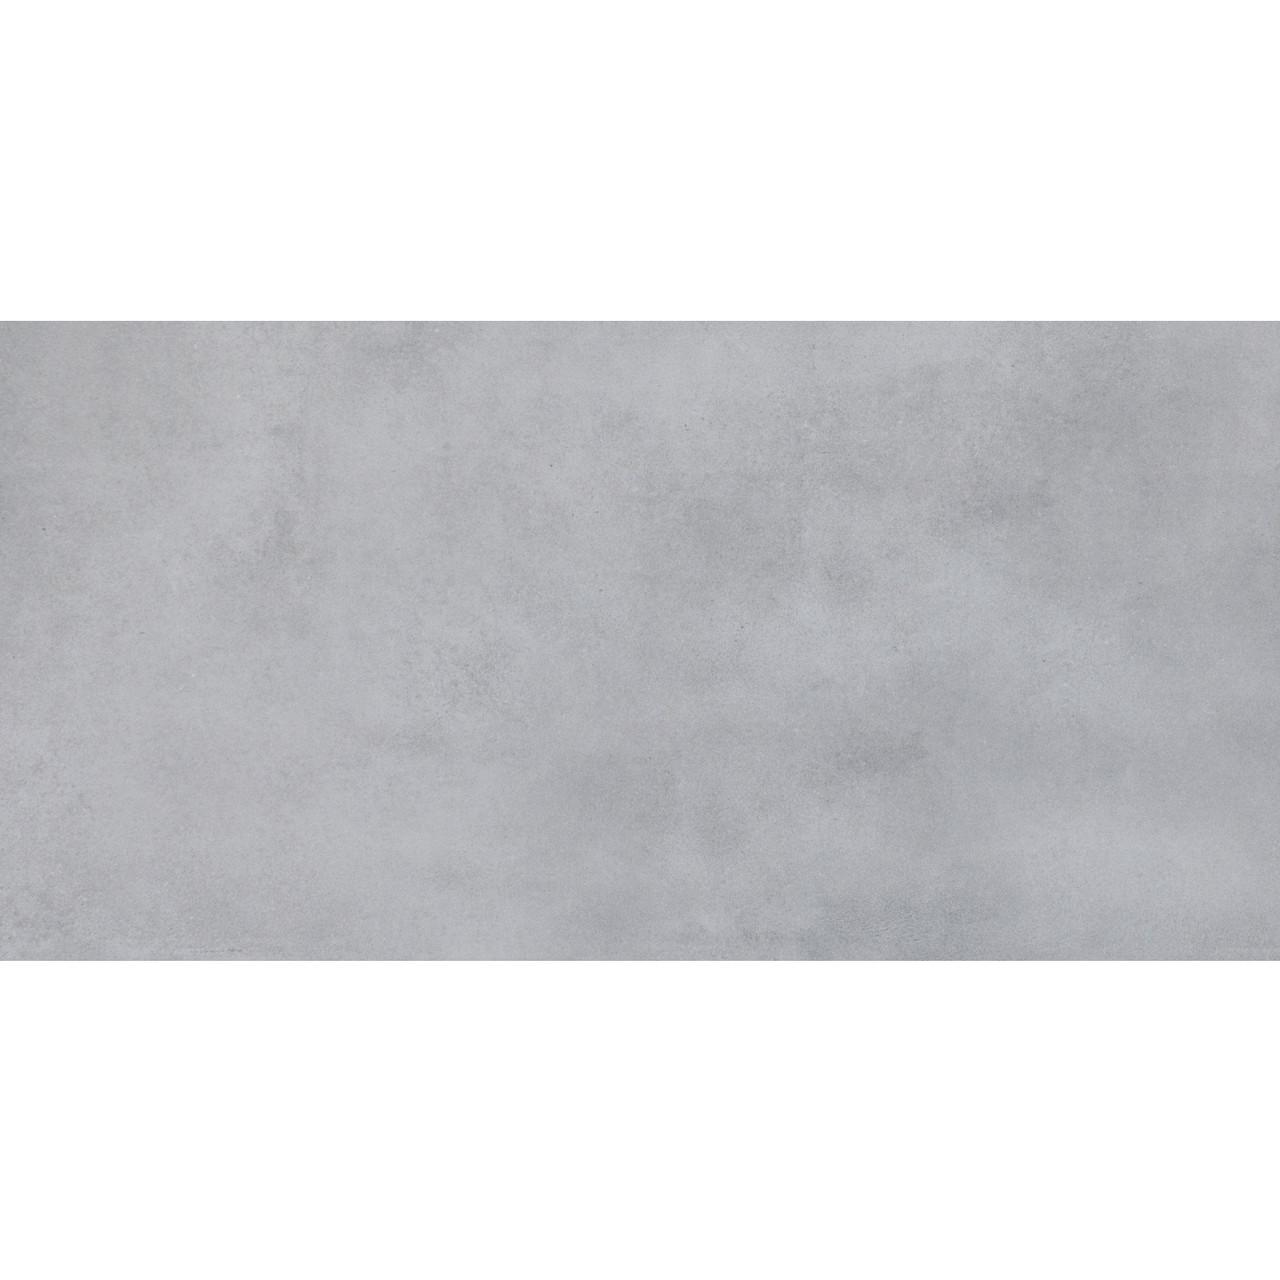 Плитка під камінь Cerrad Batista Marengo  119,7x59,7